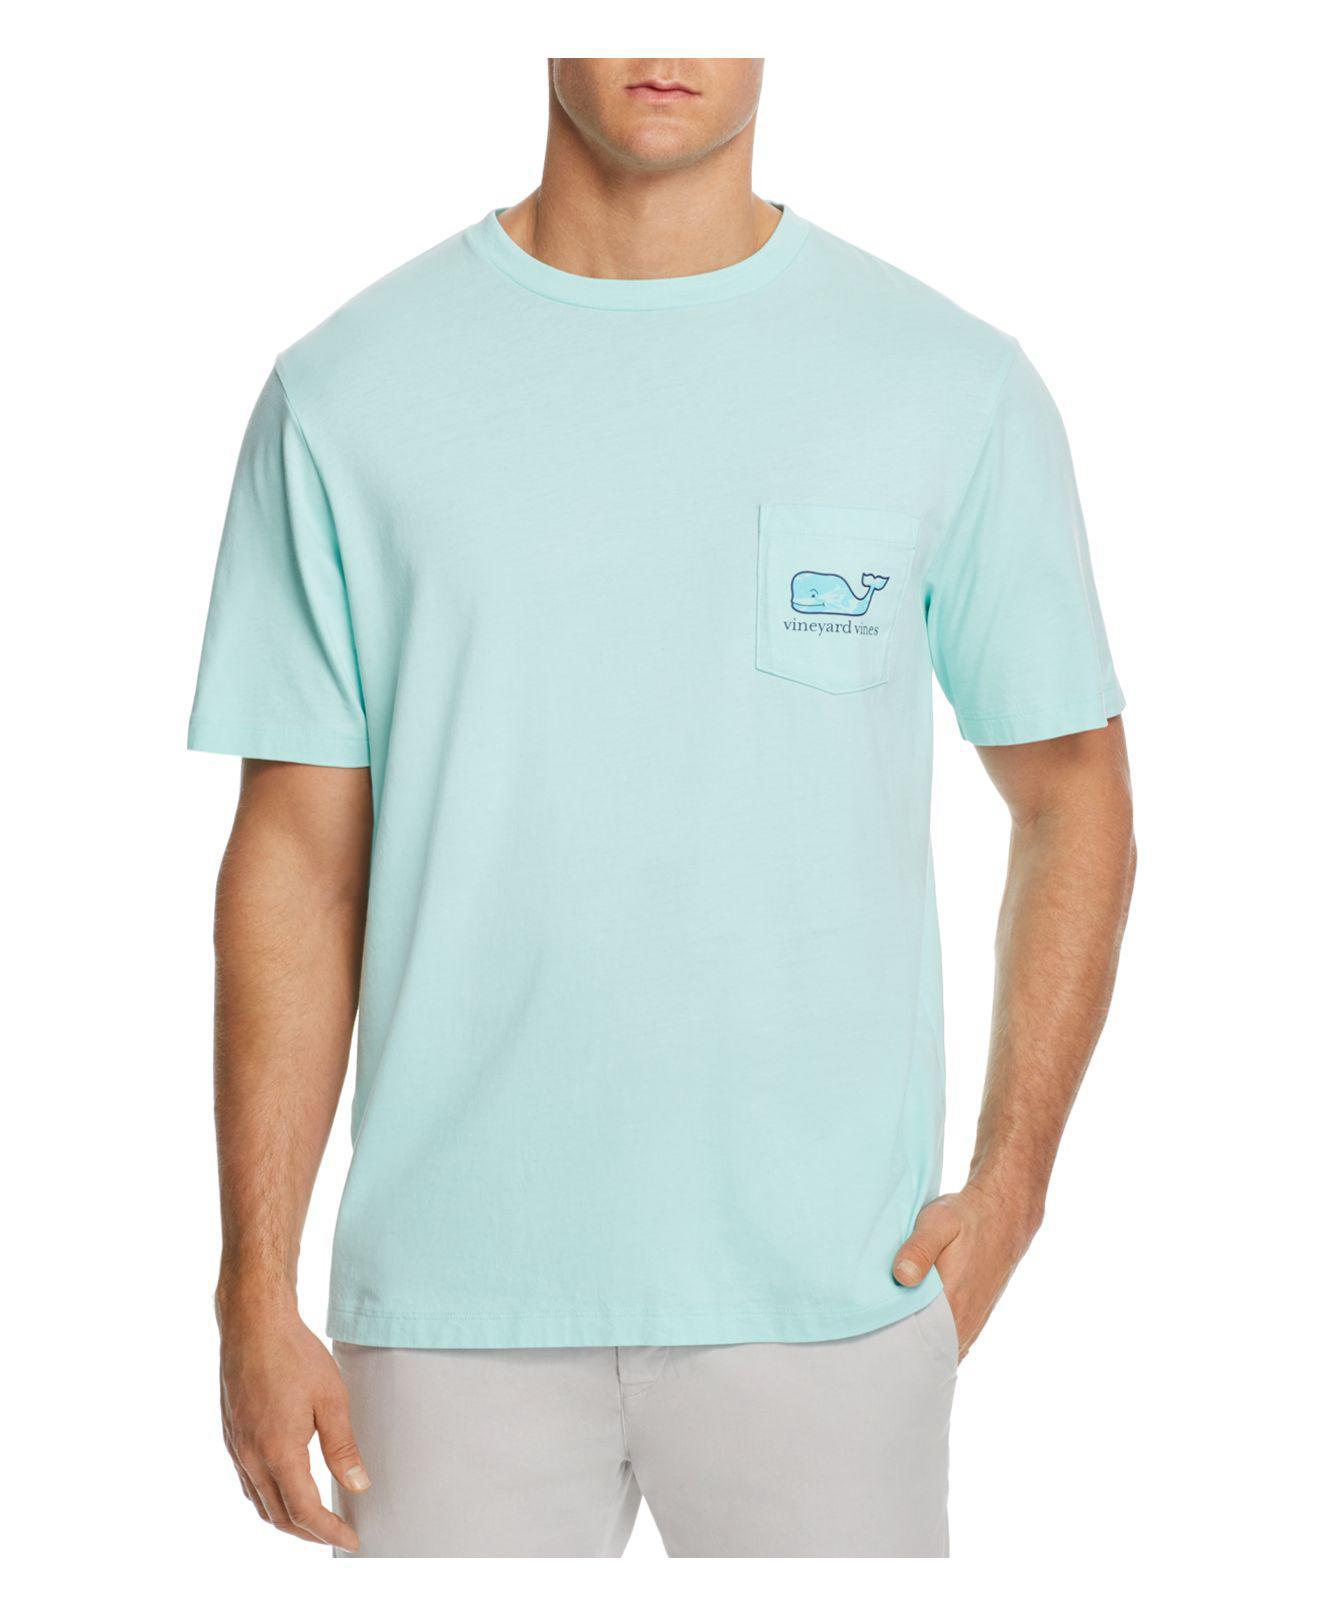 Lyst vineyard vines tri fish pocket tee in blue for men for Vineyard vines fishing shirt